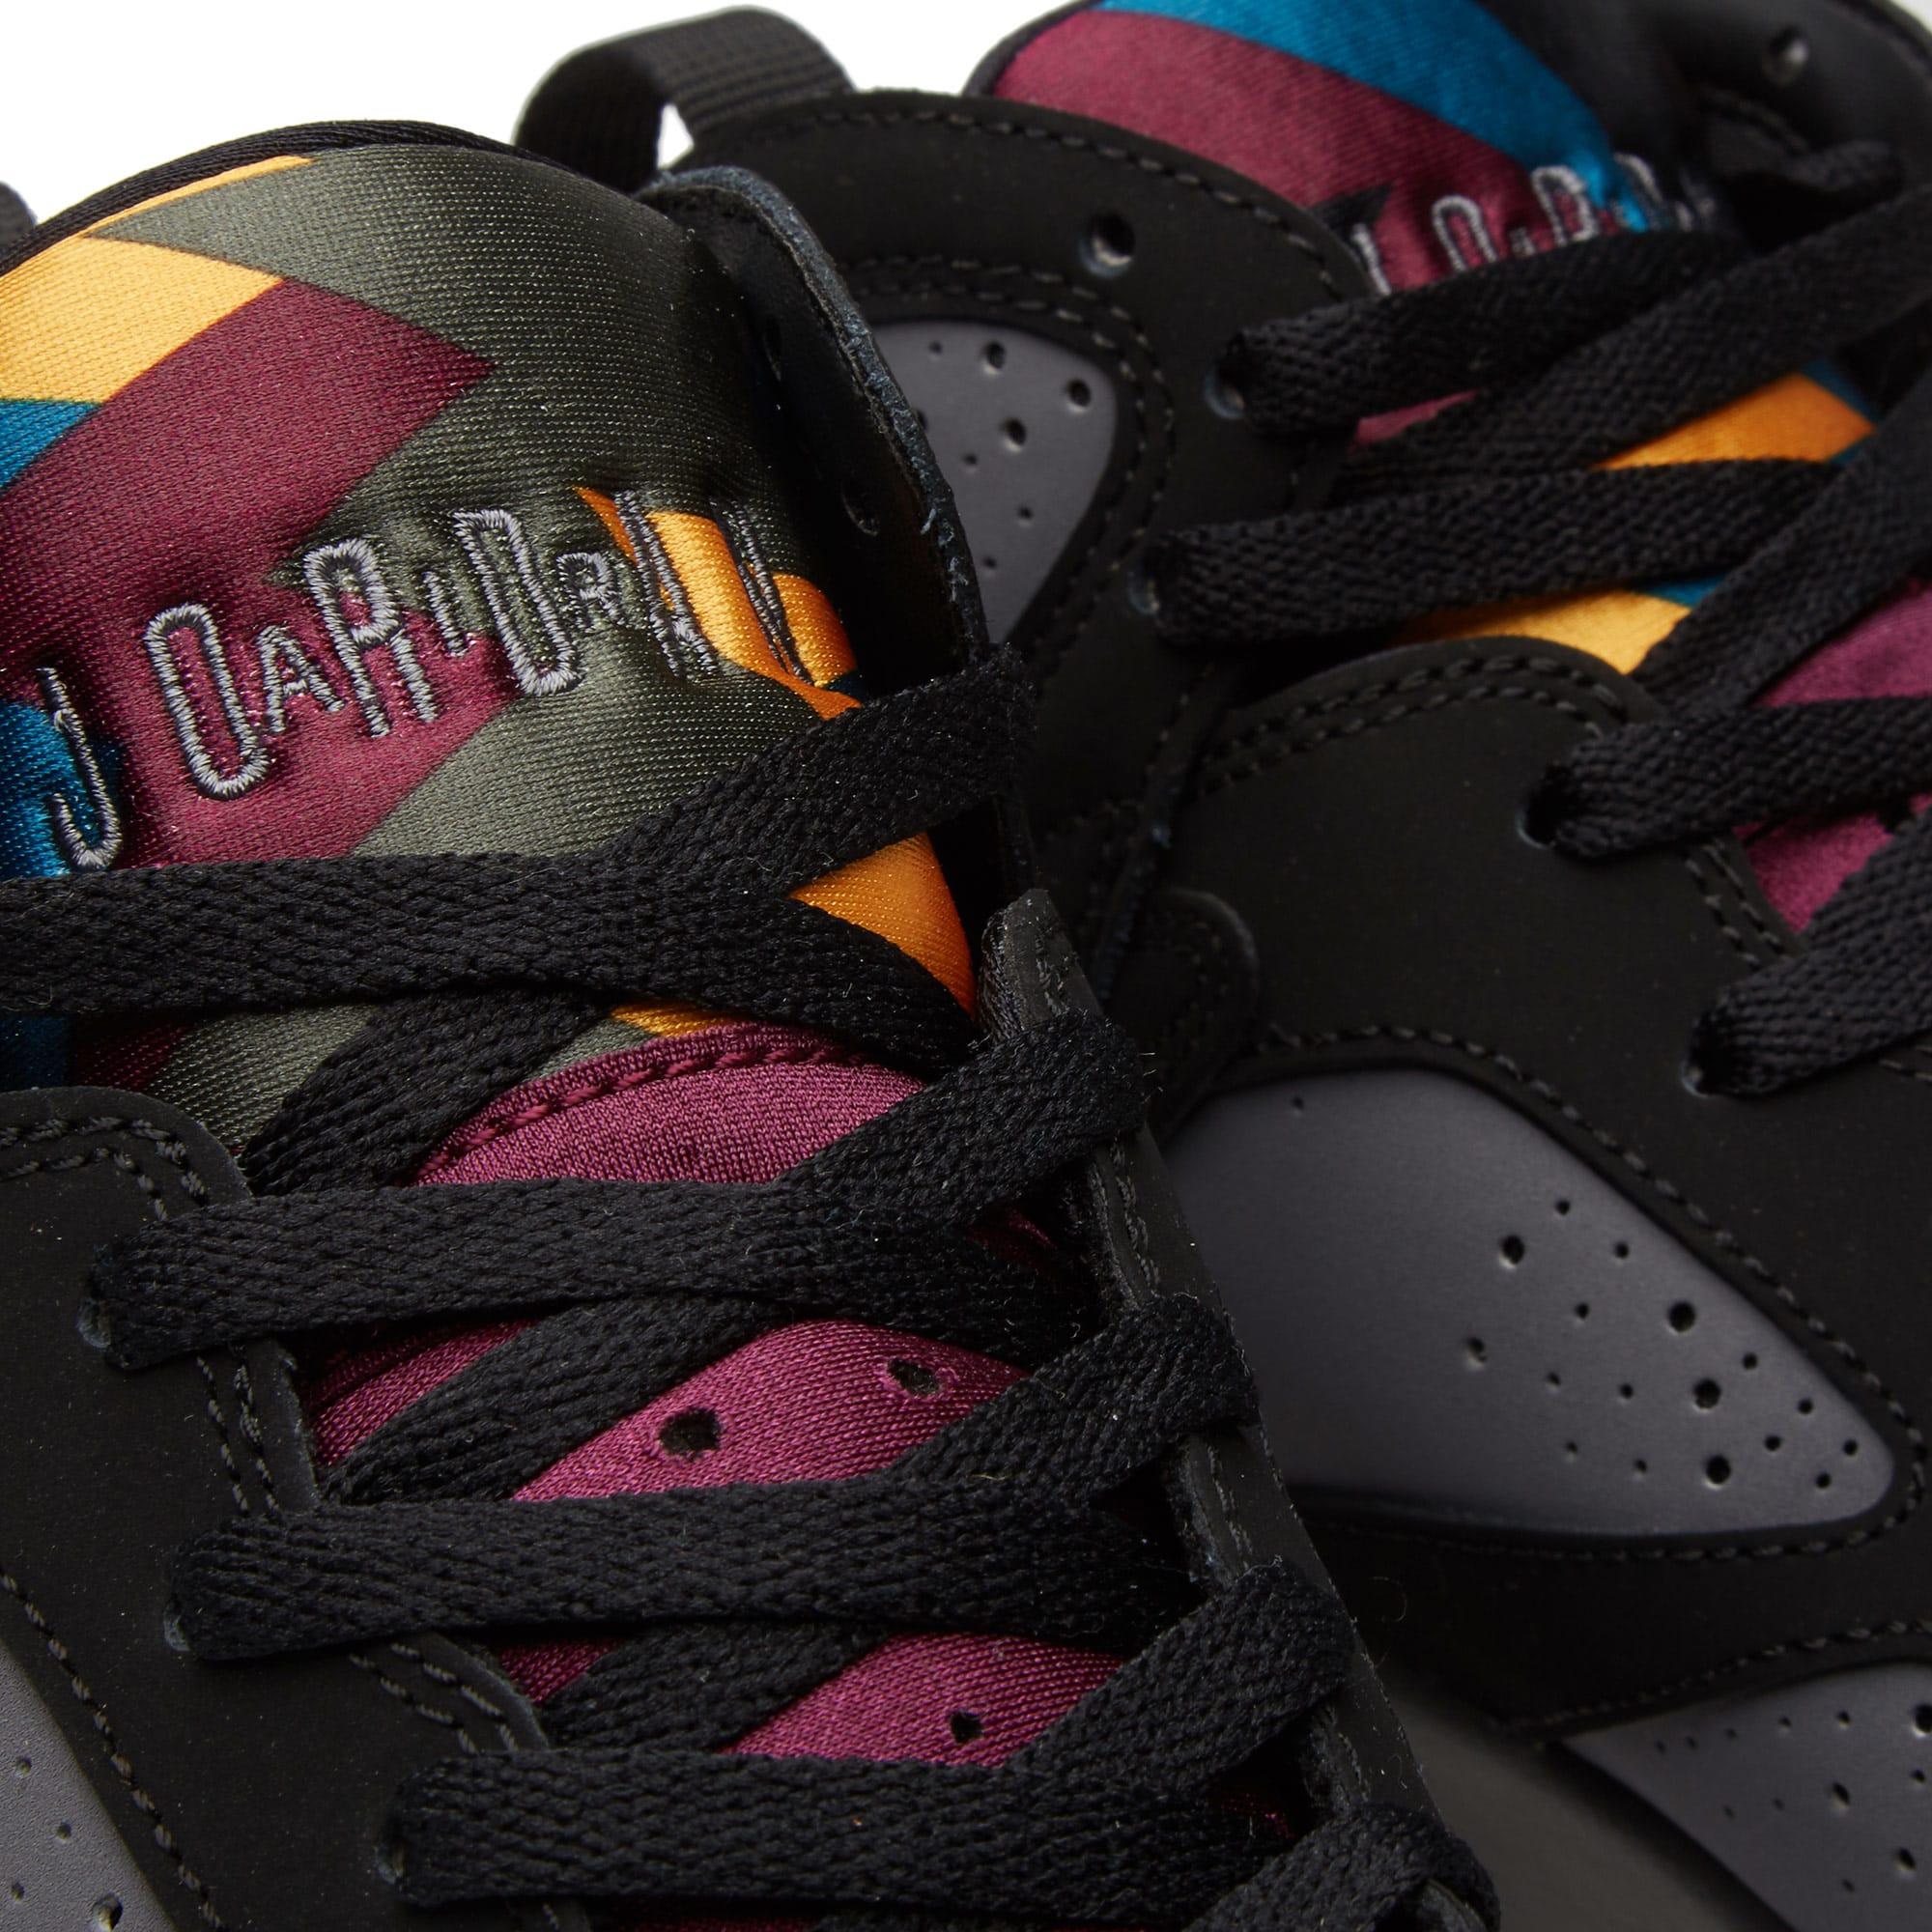 108abb3ad76887 Nike Air Jordan VII Retro BG Black